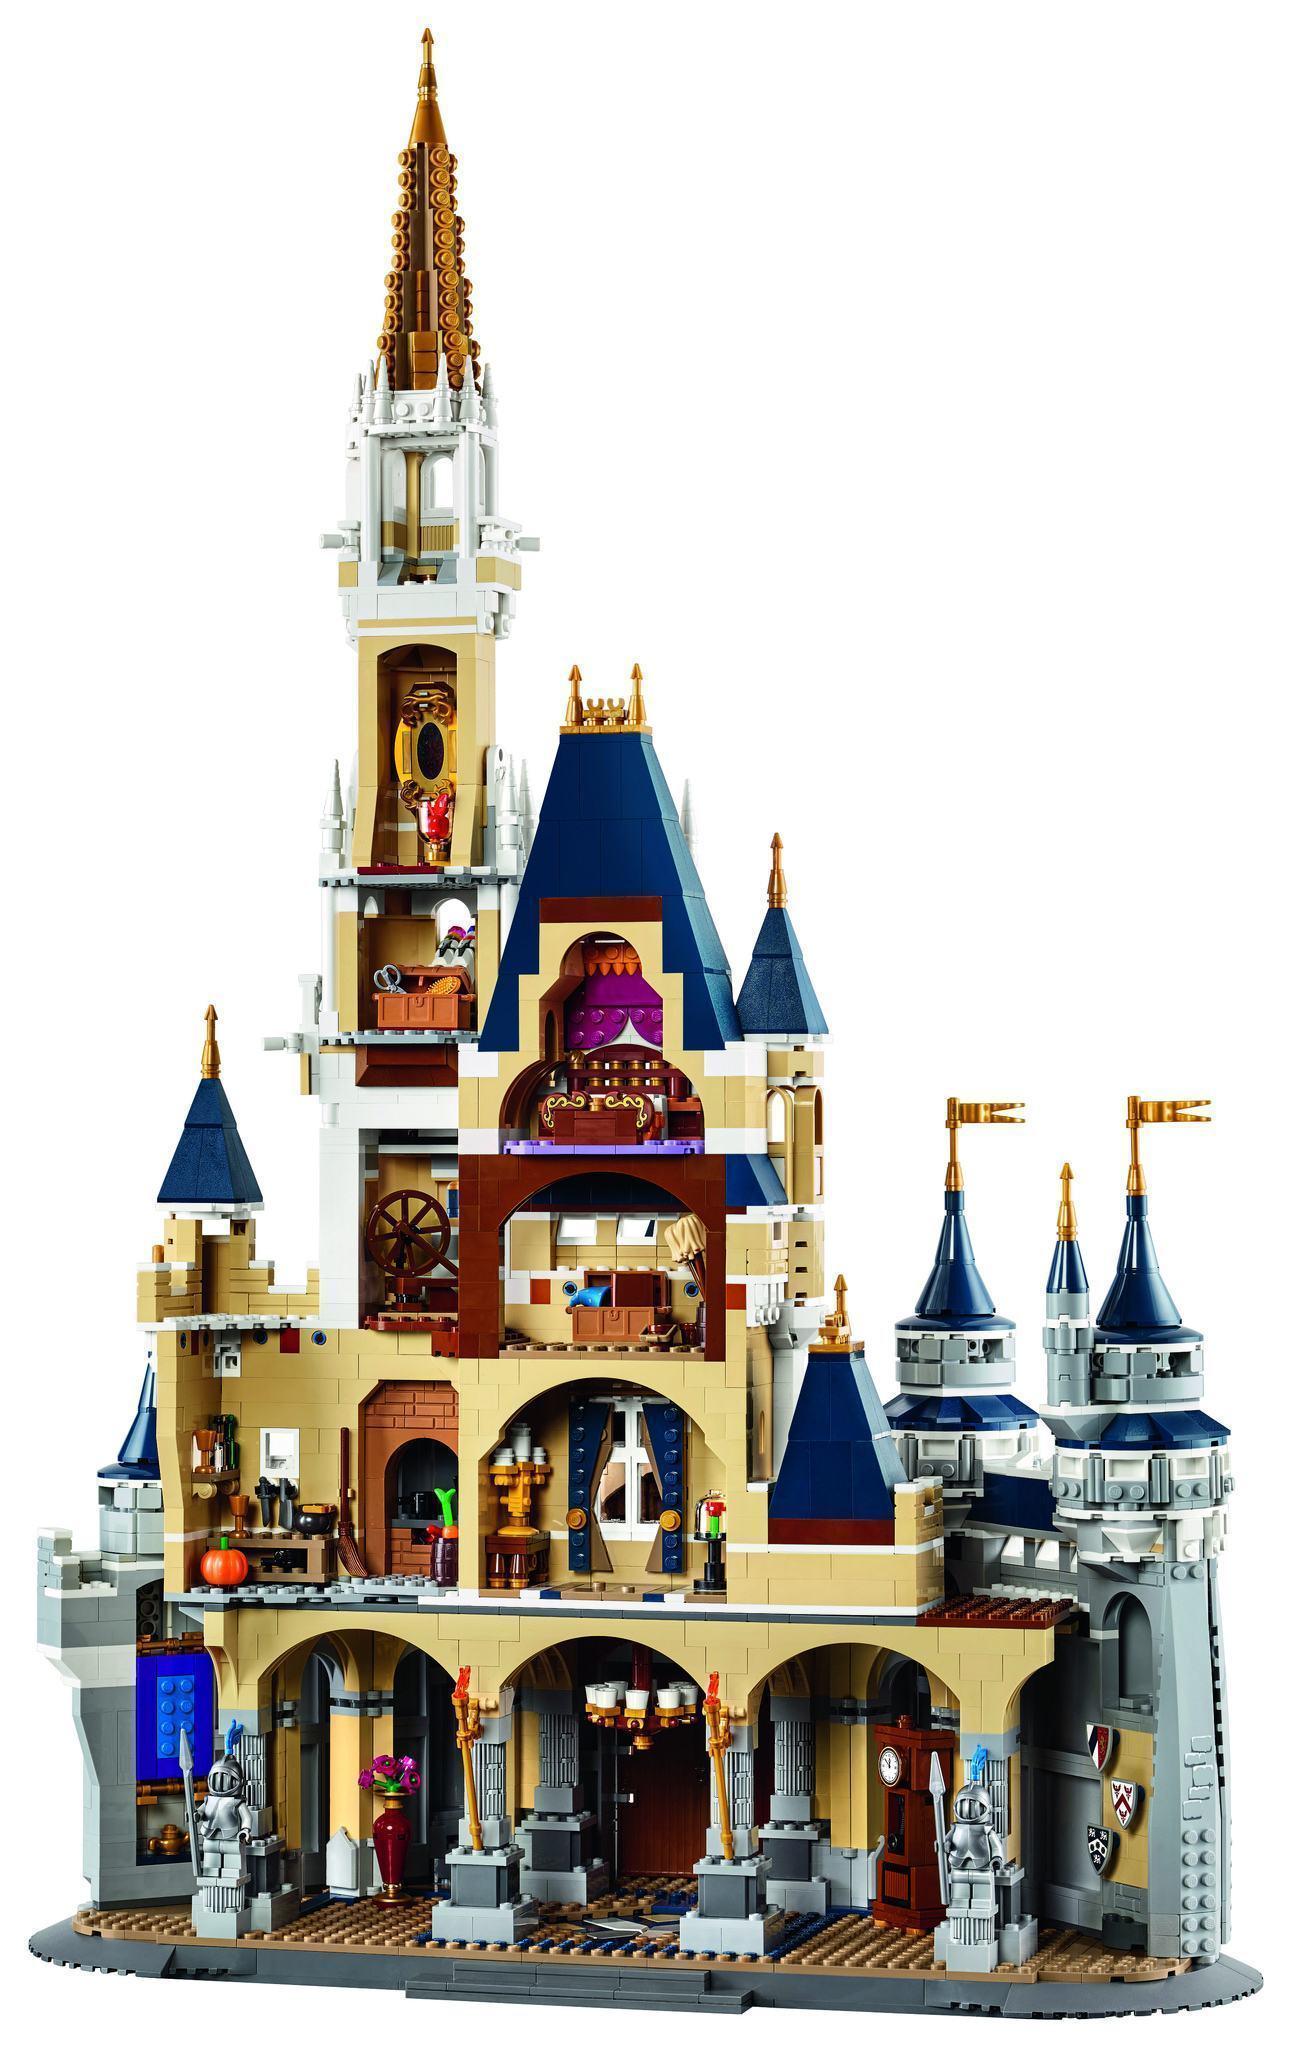 LEGO-The-Disney-Castle-Cinderella-01b